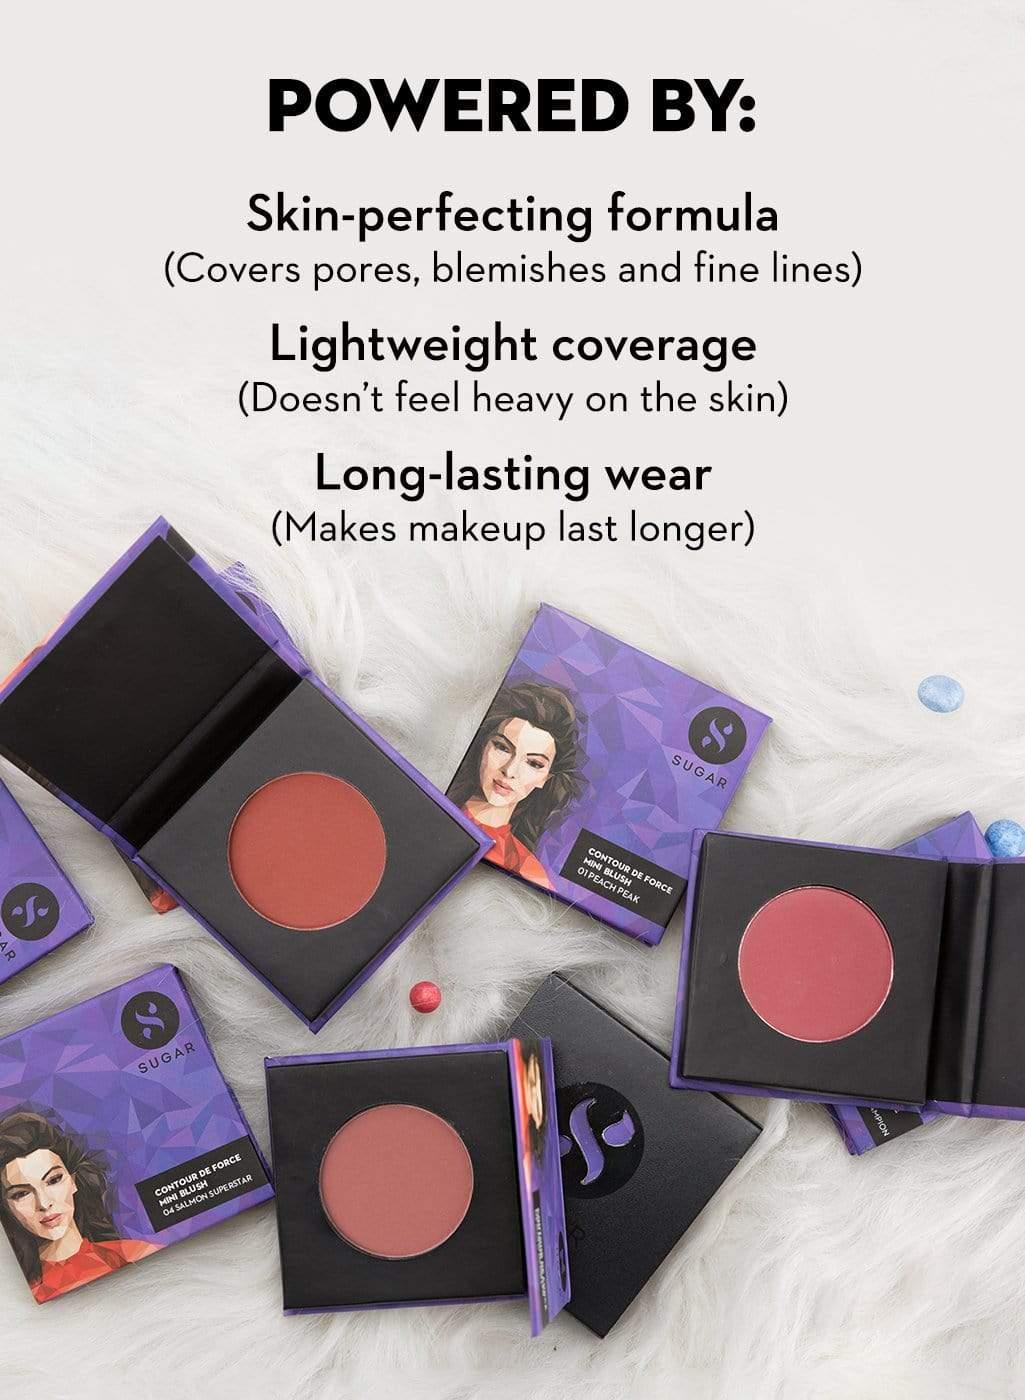 Pinnacle Cosmetics Reviews : pinnacle, cosmetics, reviews, Pinnacle, Cosmetics, Reviews